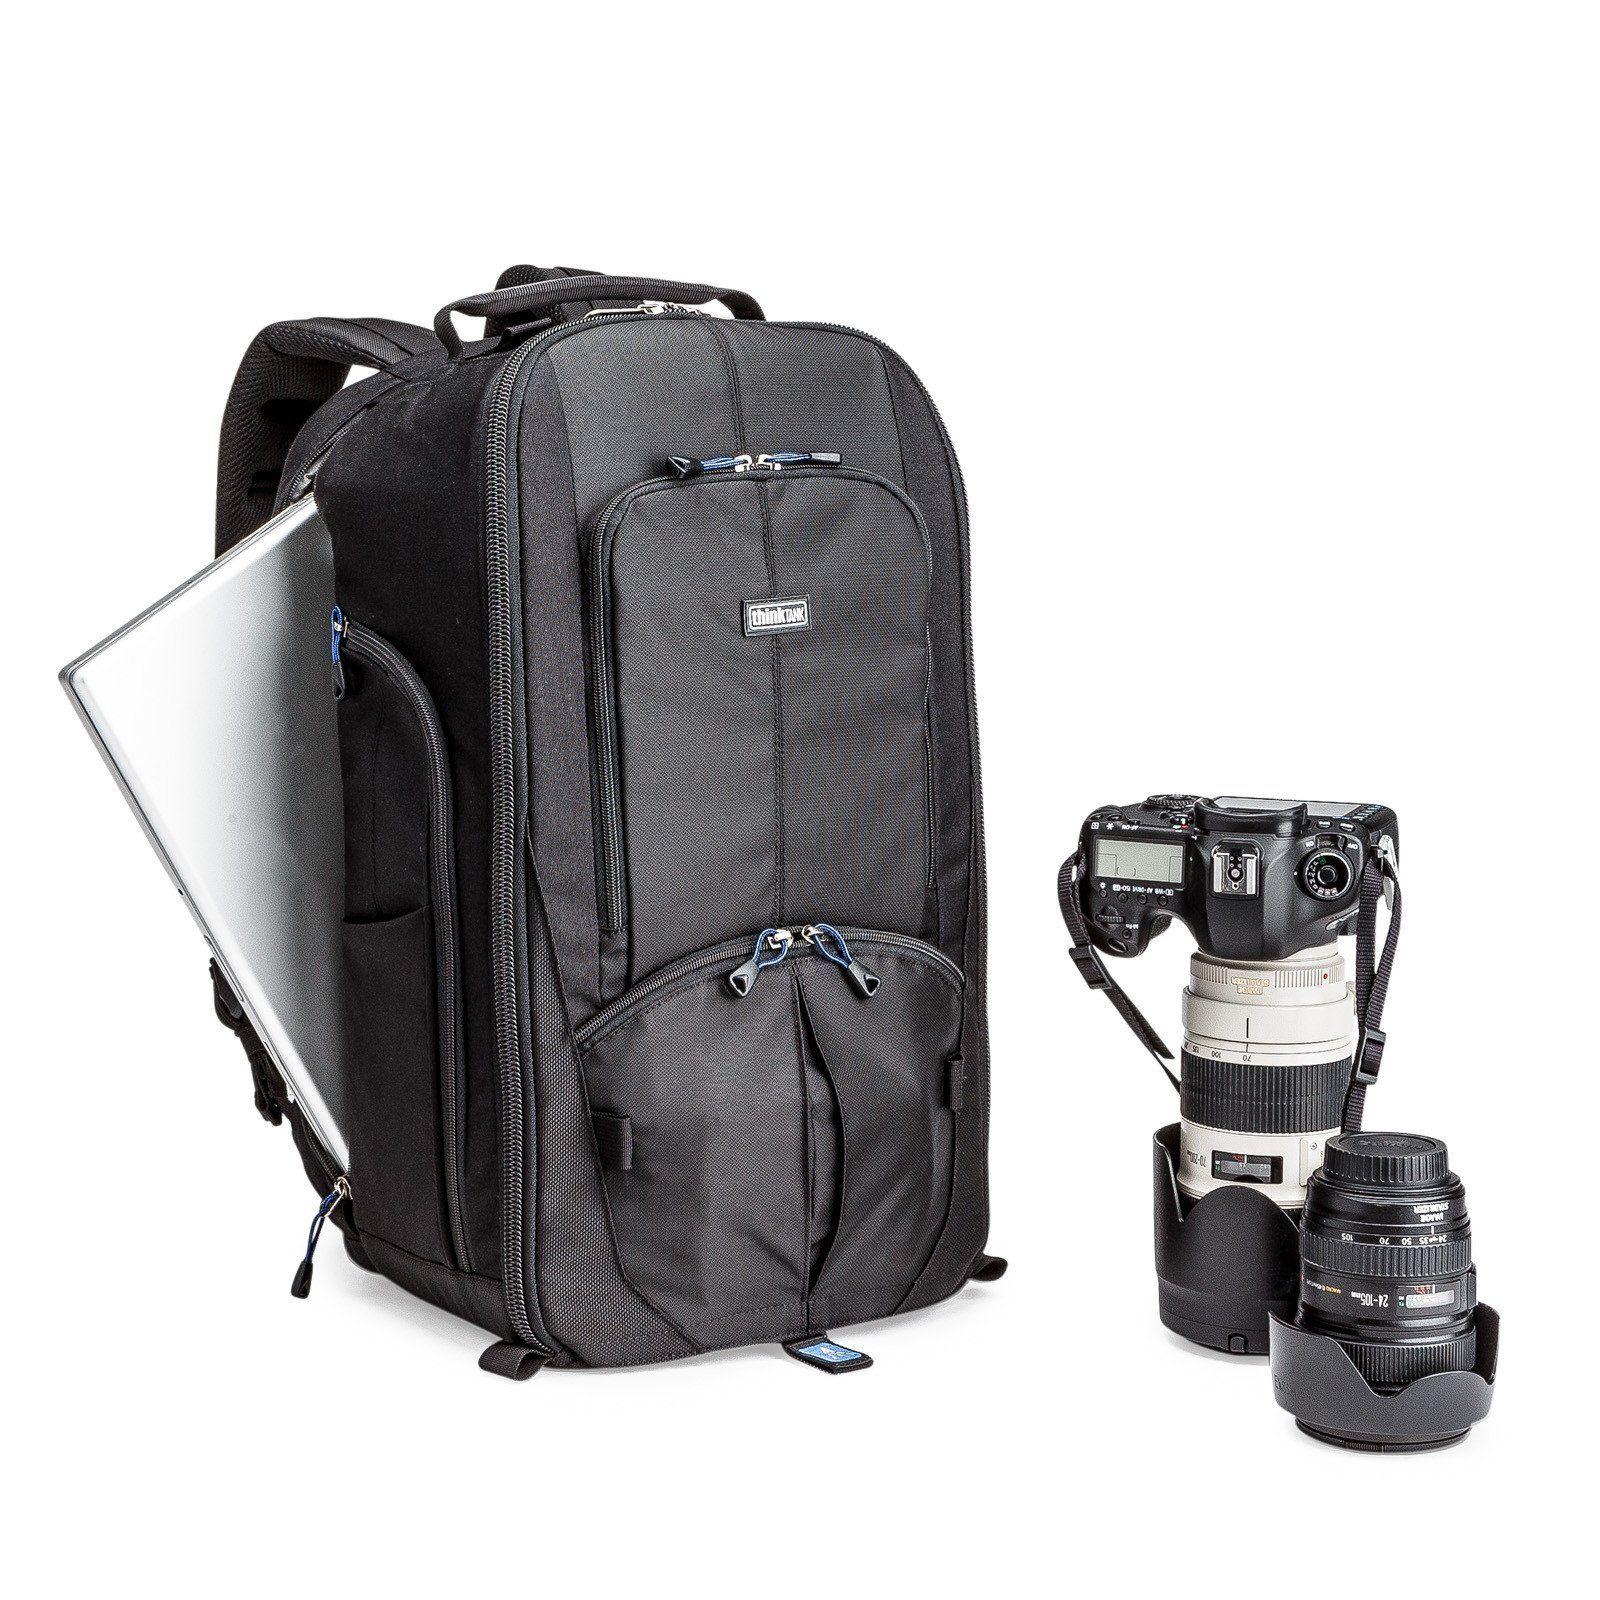 Streetwalker Harddrive V20 Camera Bag Pinterest Lowepro Flipside 300 Aw Ii Camo Tas Kamera Fotocamera Zaino Borse Fotocamere Dslr Gruppo Di Esperti